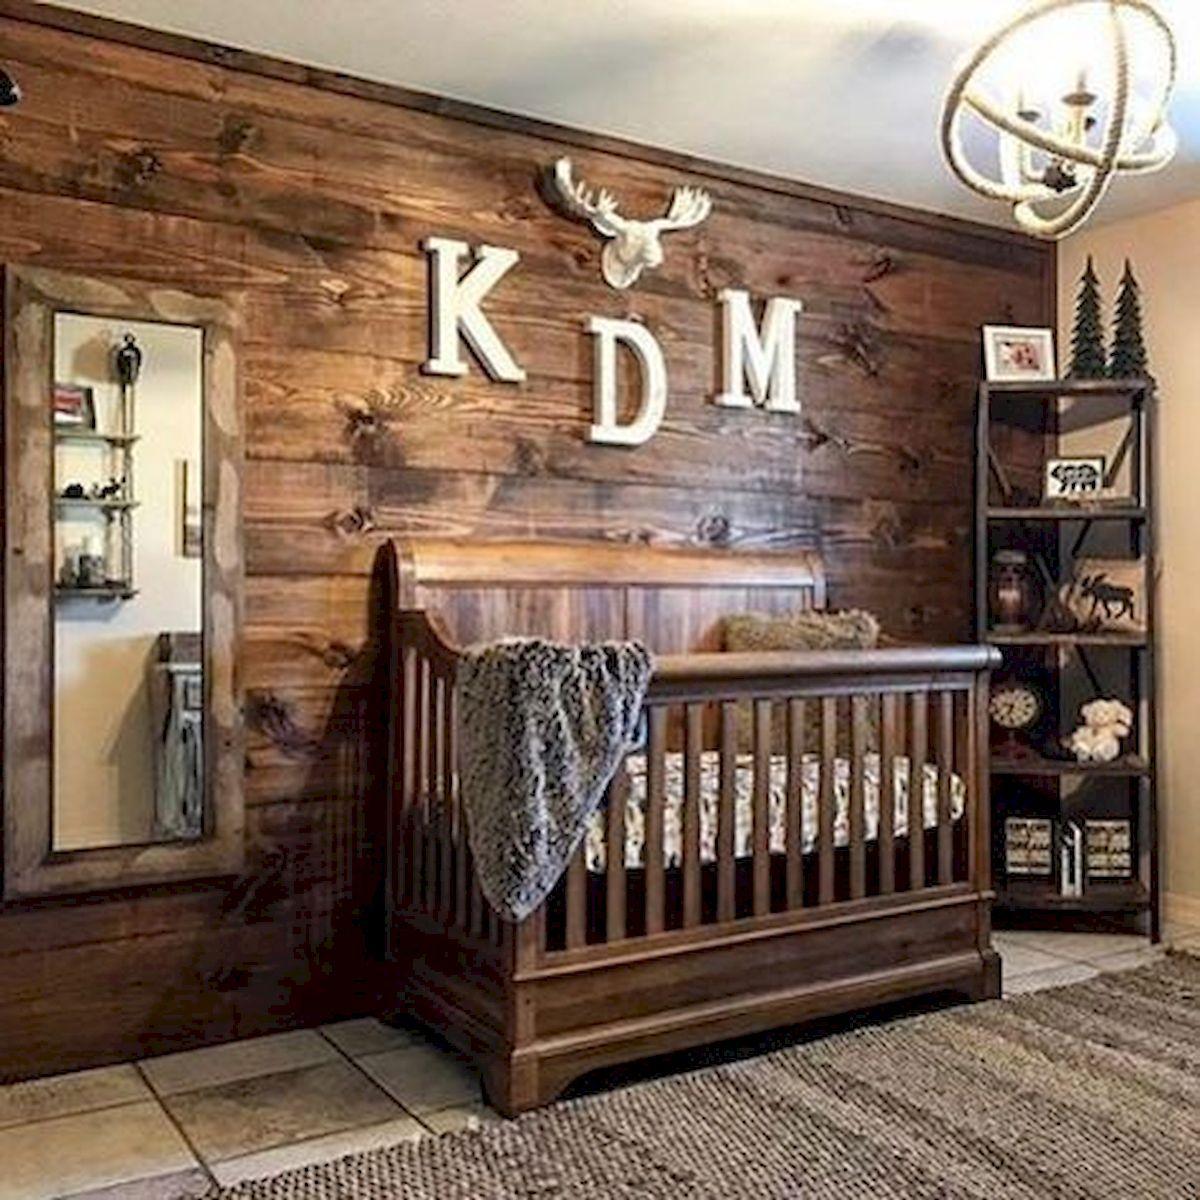 Adorable Nursery Idea: 30 Adorable Rustic Nursery Room Ideas